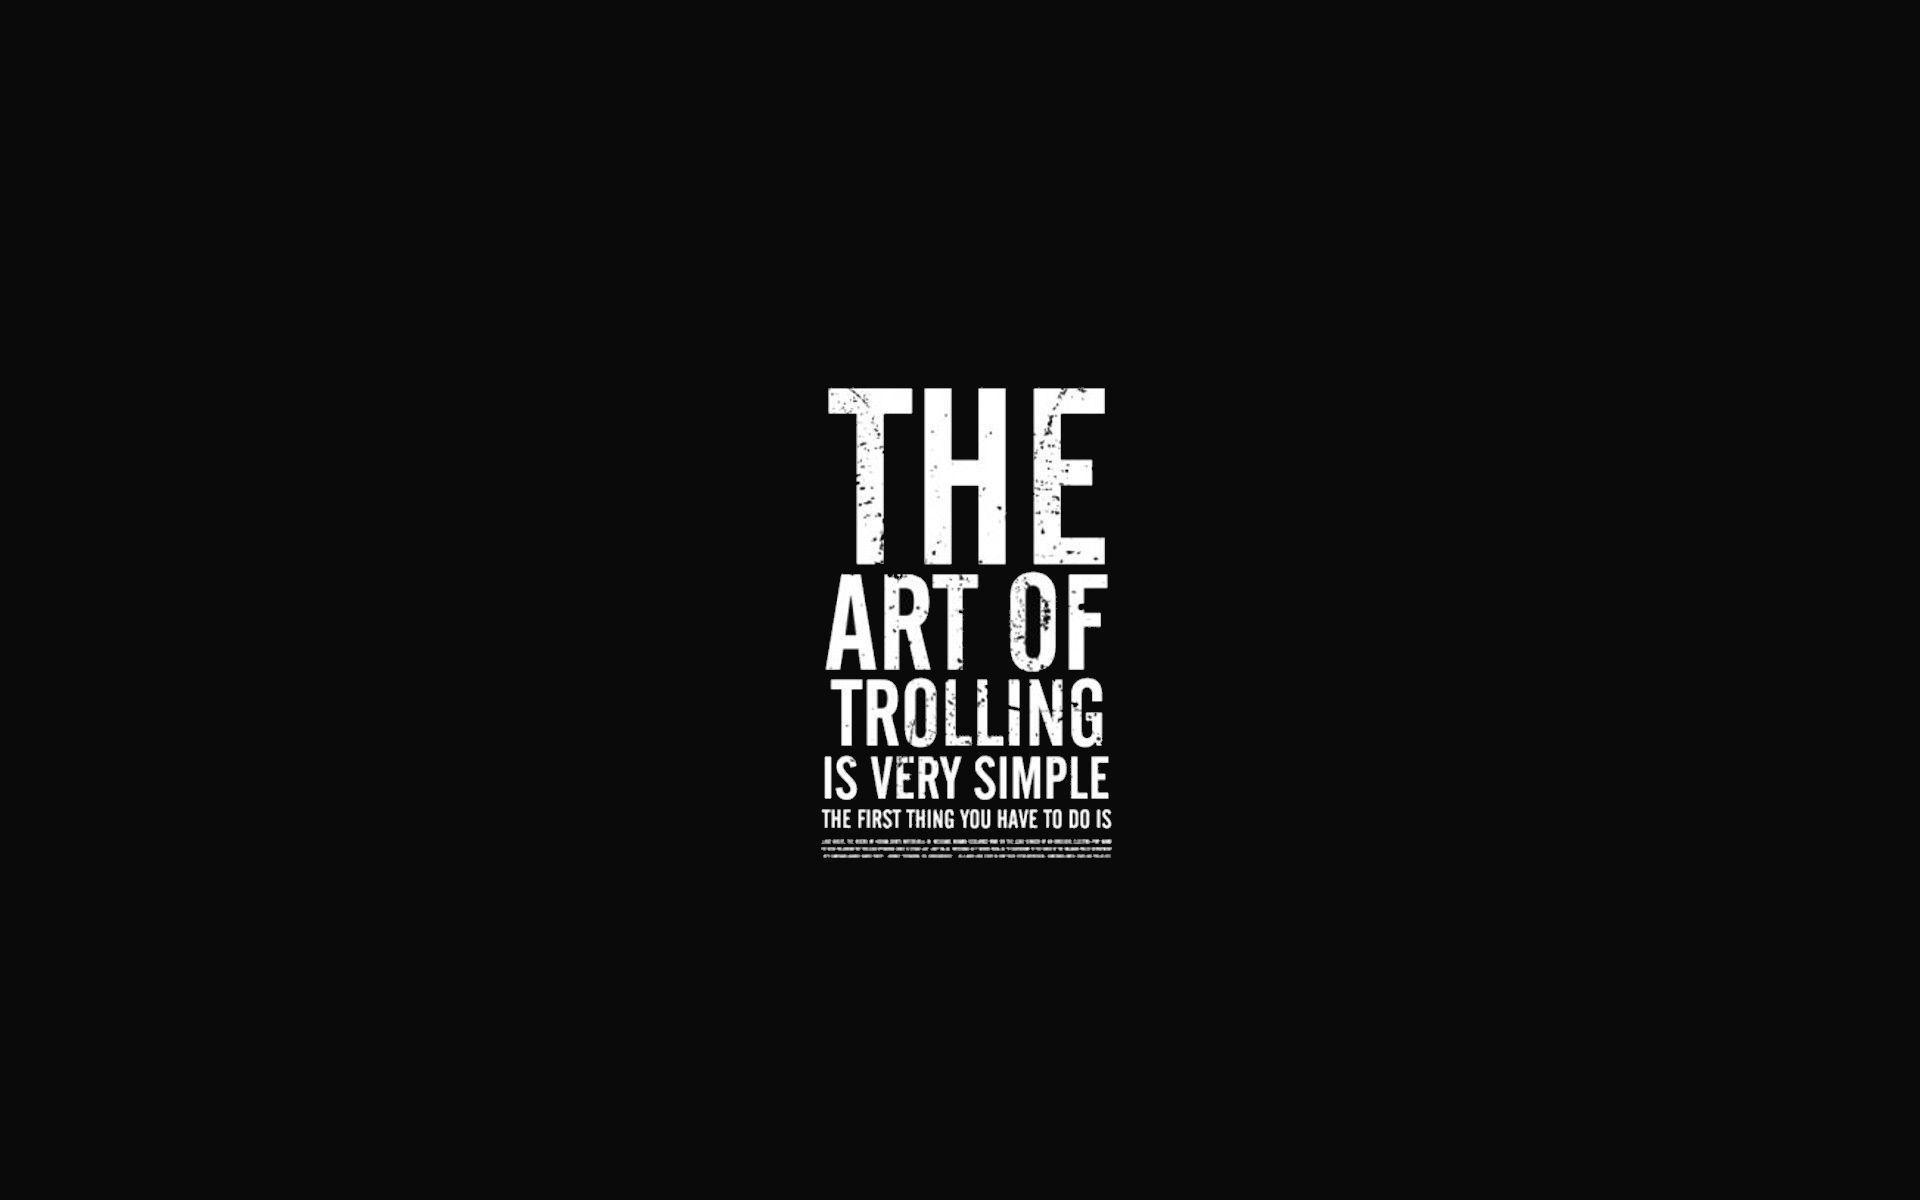 1920x1200 Troll Wallpapers - Full HD wallpaper search